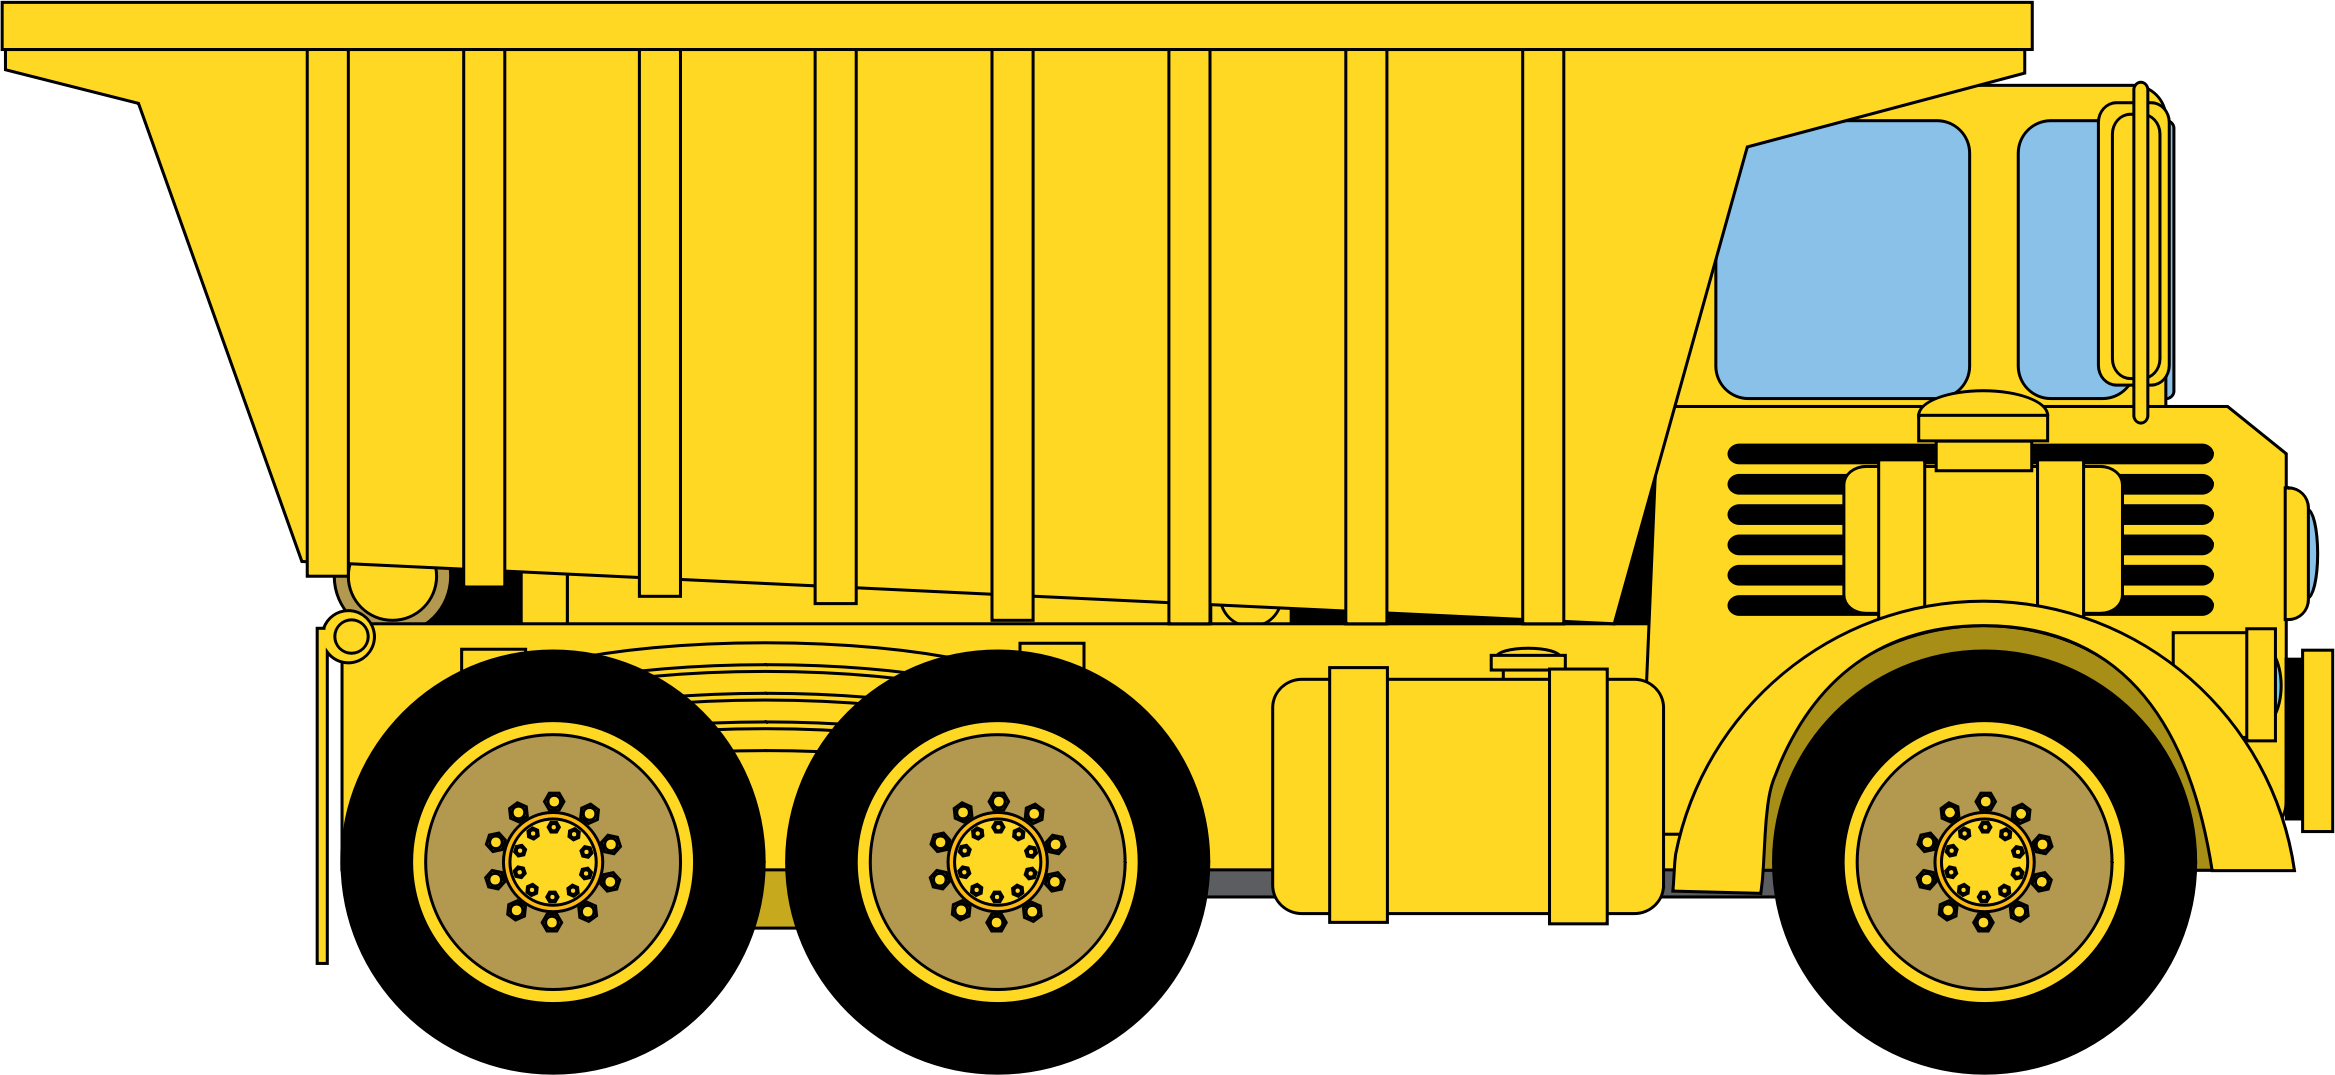 Transparent dump truck clip art - Download - Dump Truck Clipart Png